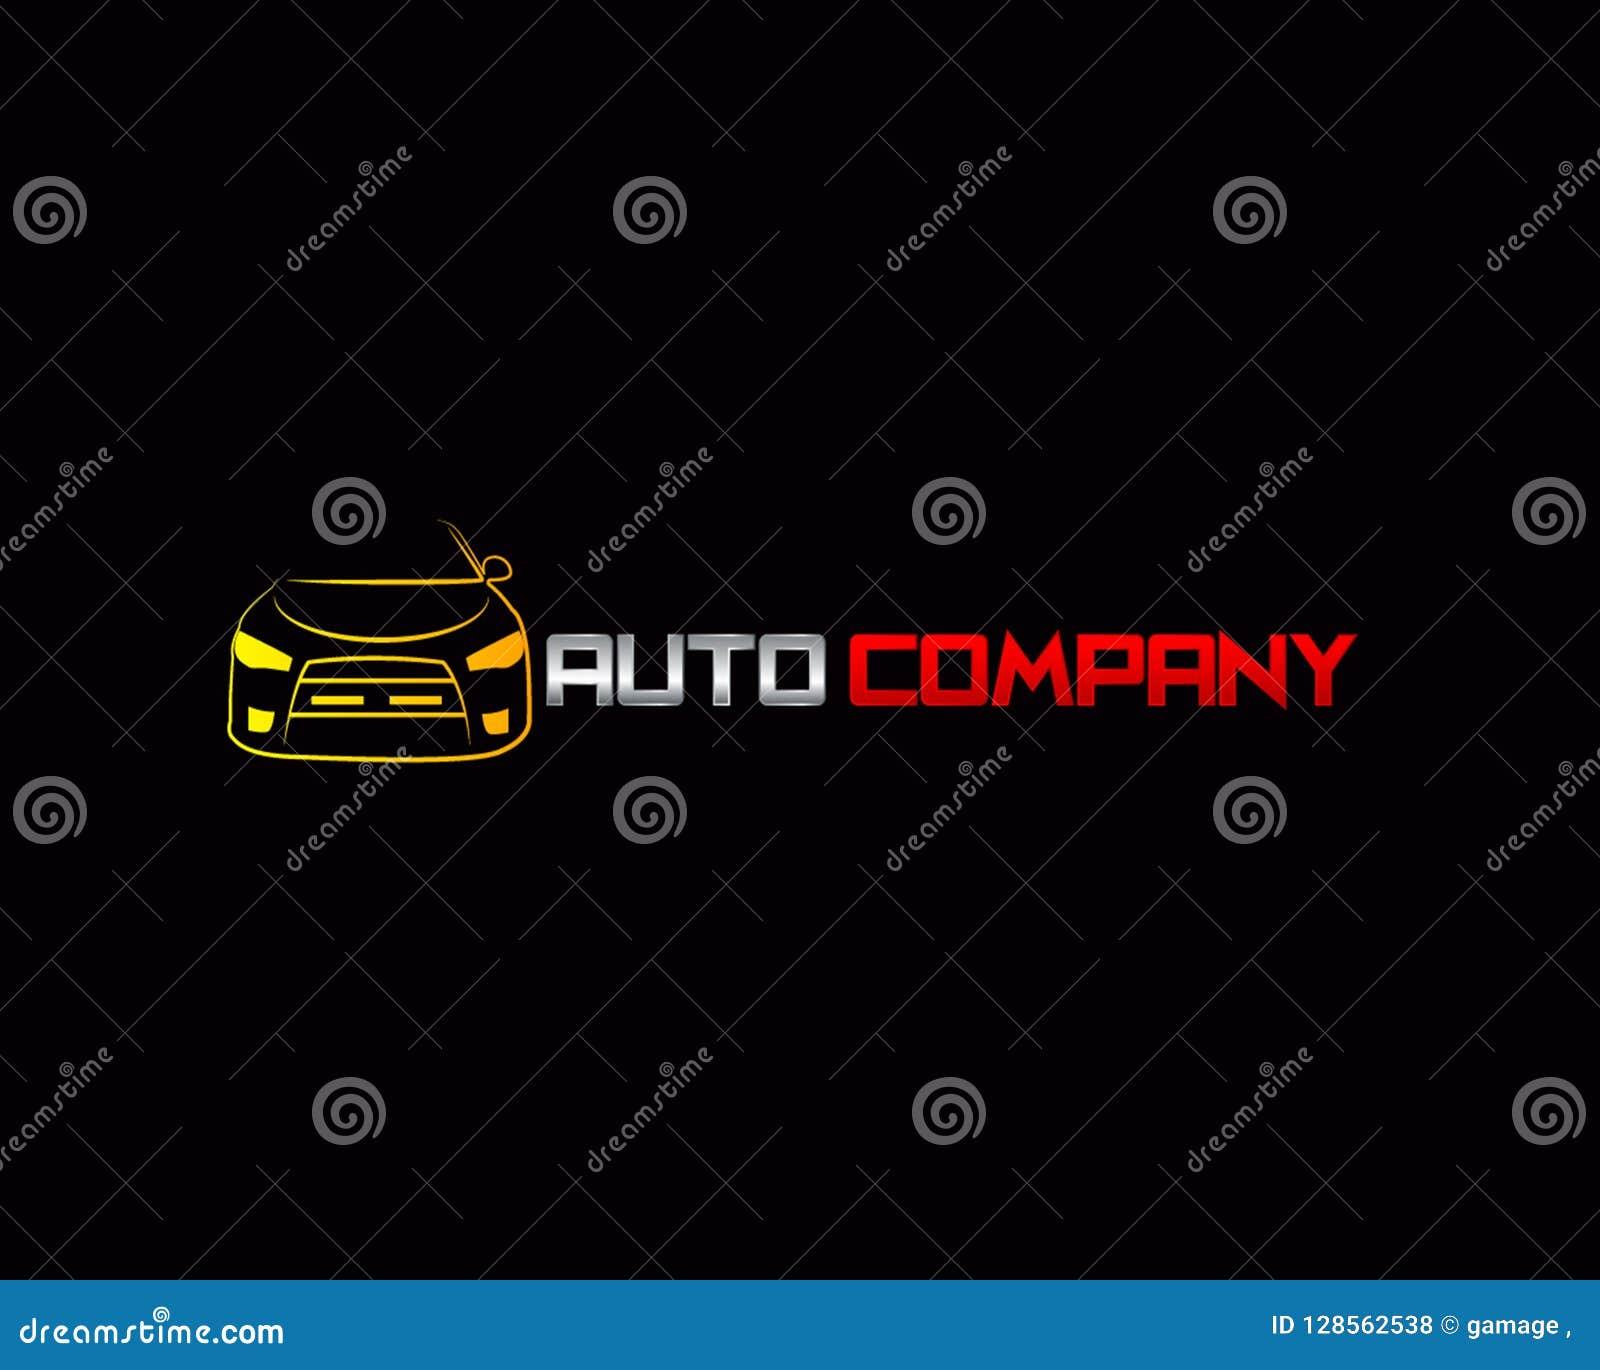 Modern Auto Company Logo Design Vector And Illustration Stock